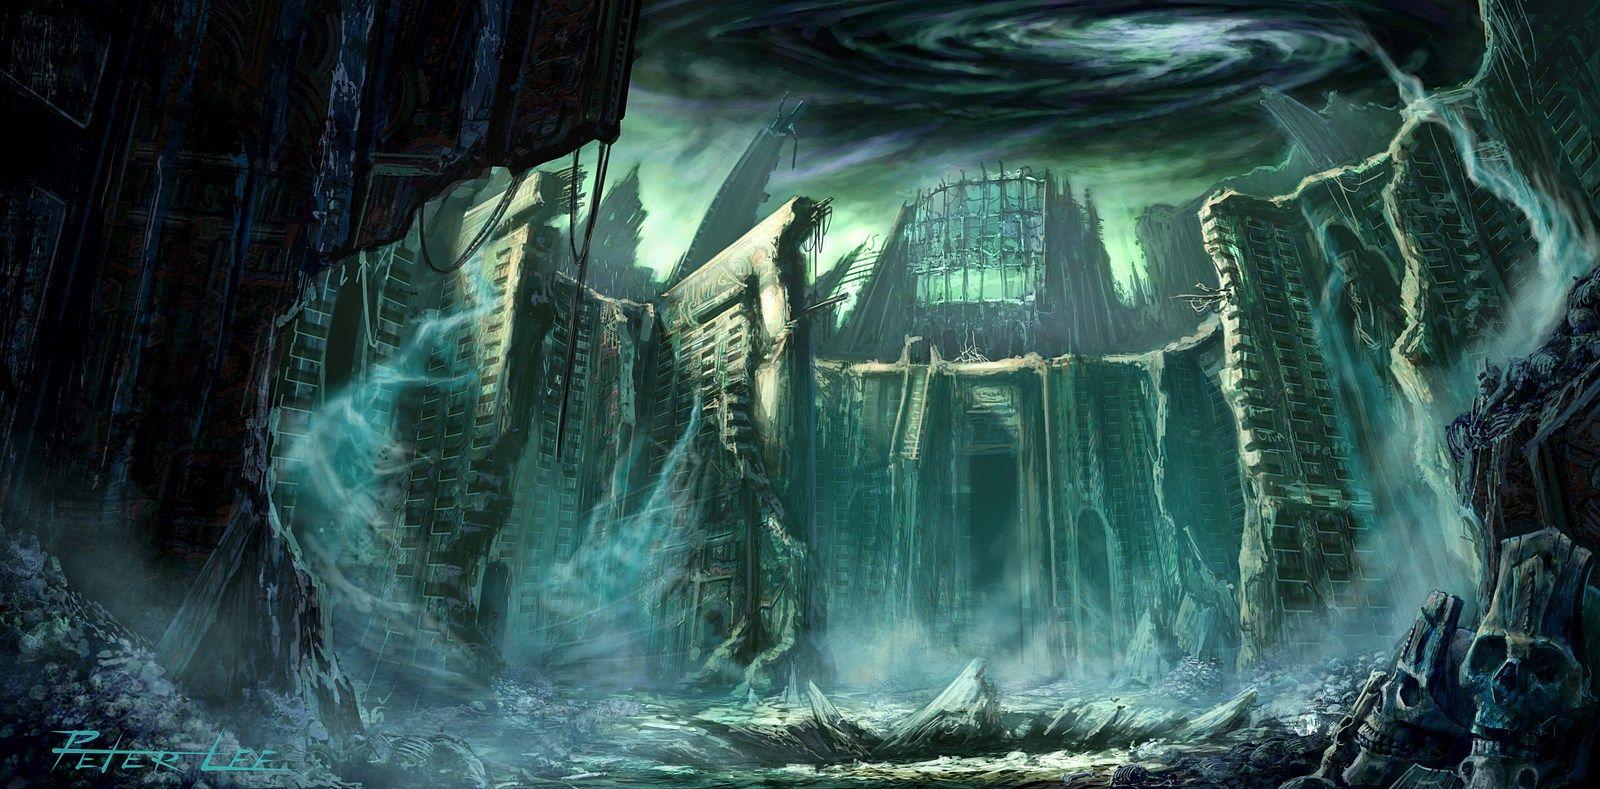 Widescreen Wallpaper World Of Warcraft The Burning Crusade